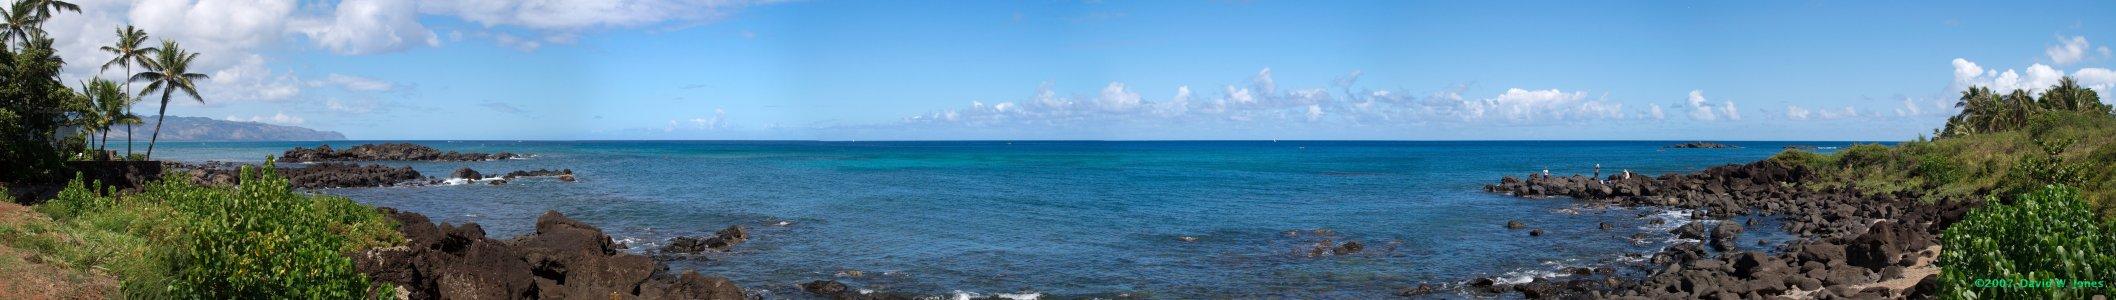 170 degree panoramic view of North Shore